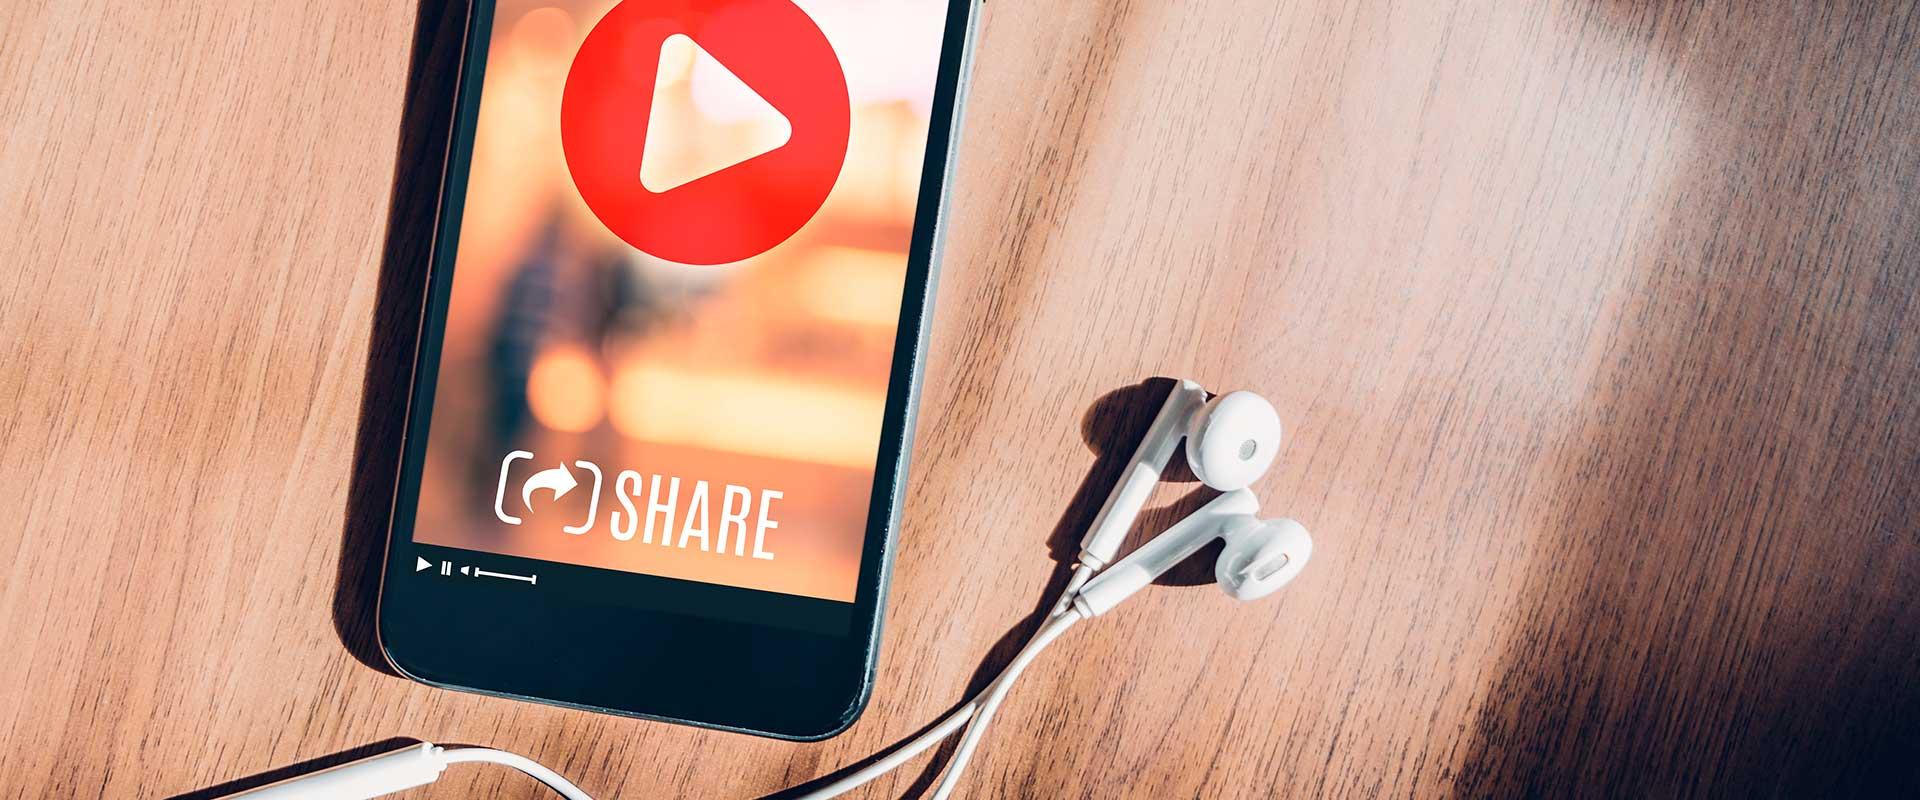 3 claves para lograr una estrategia digital ganadora a través del video